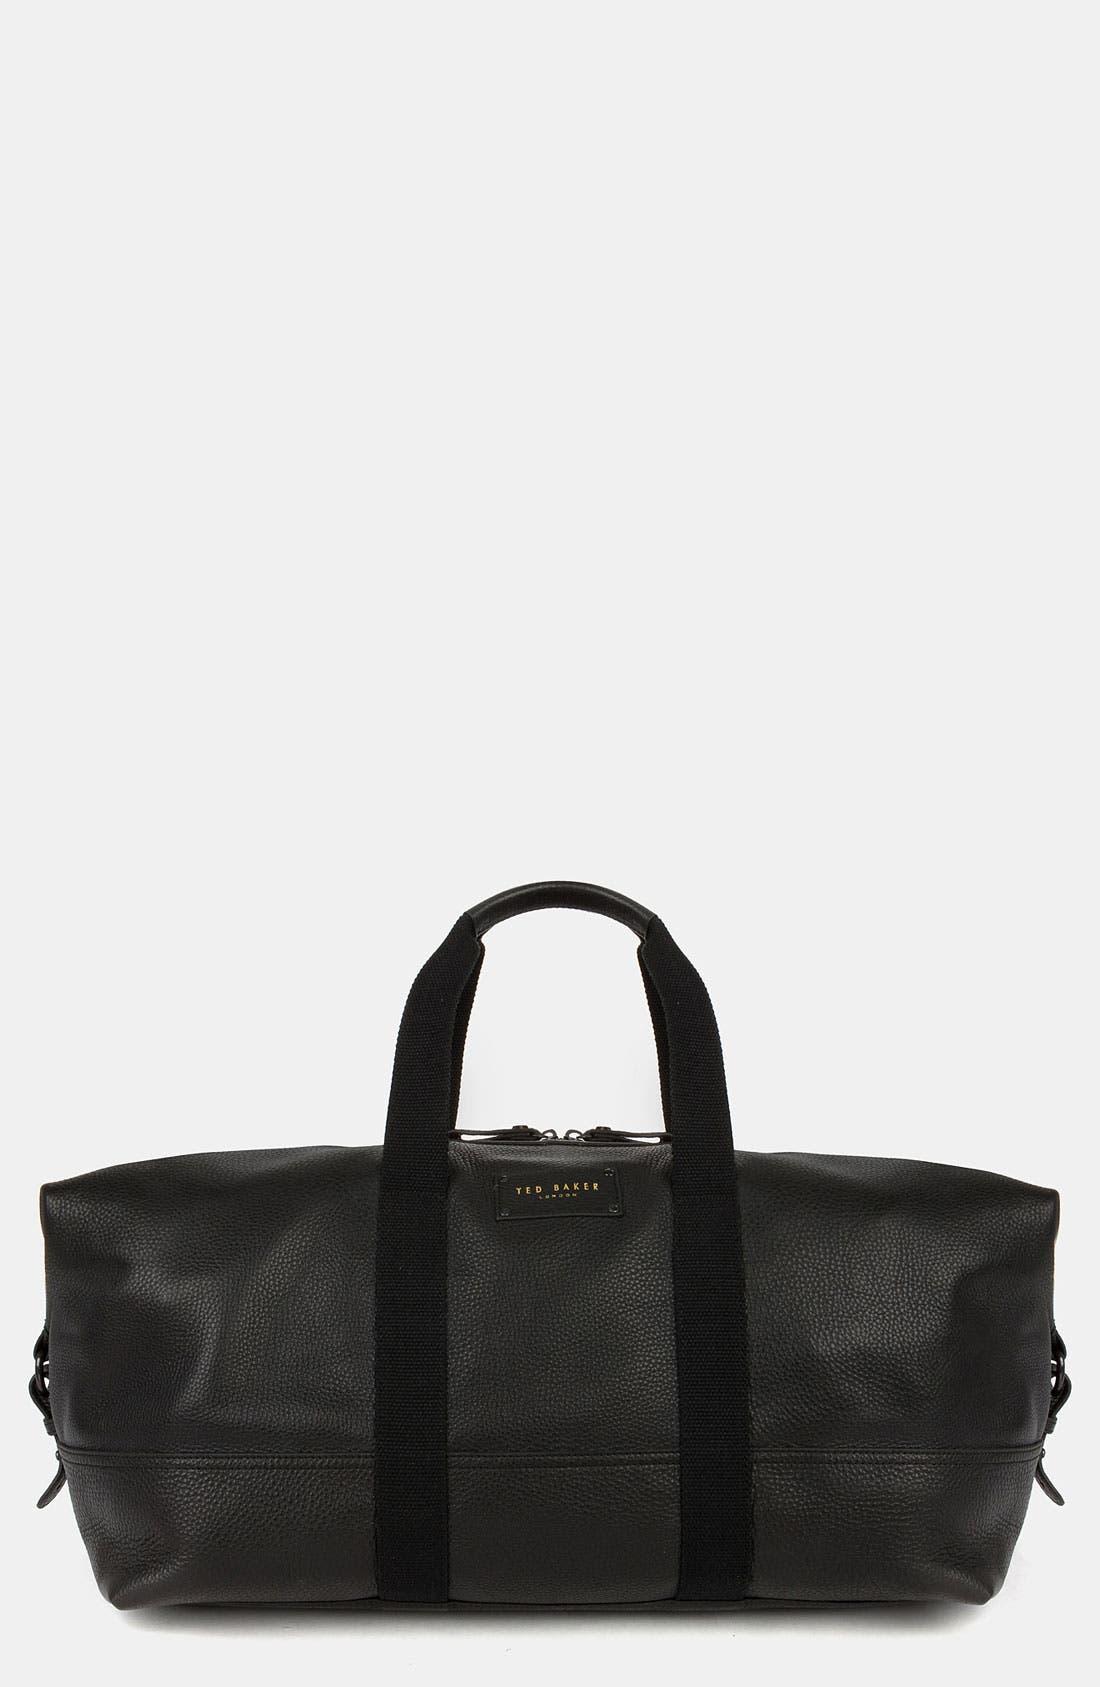 Leather Duffel Bag,                         Main,                         color,